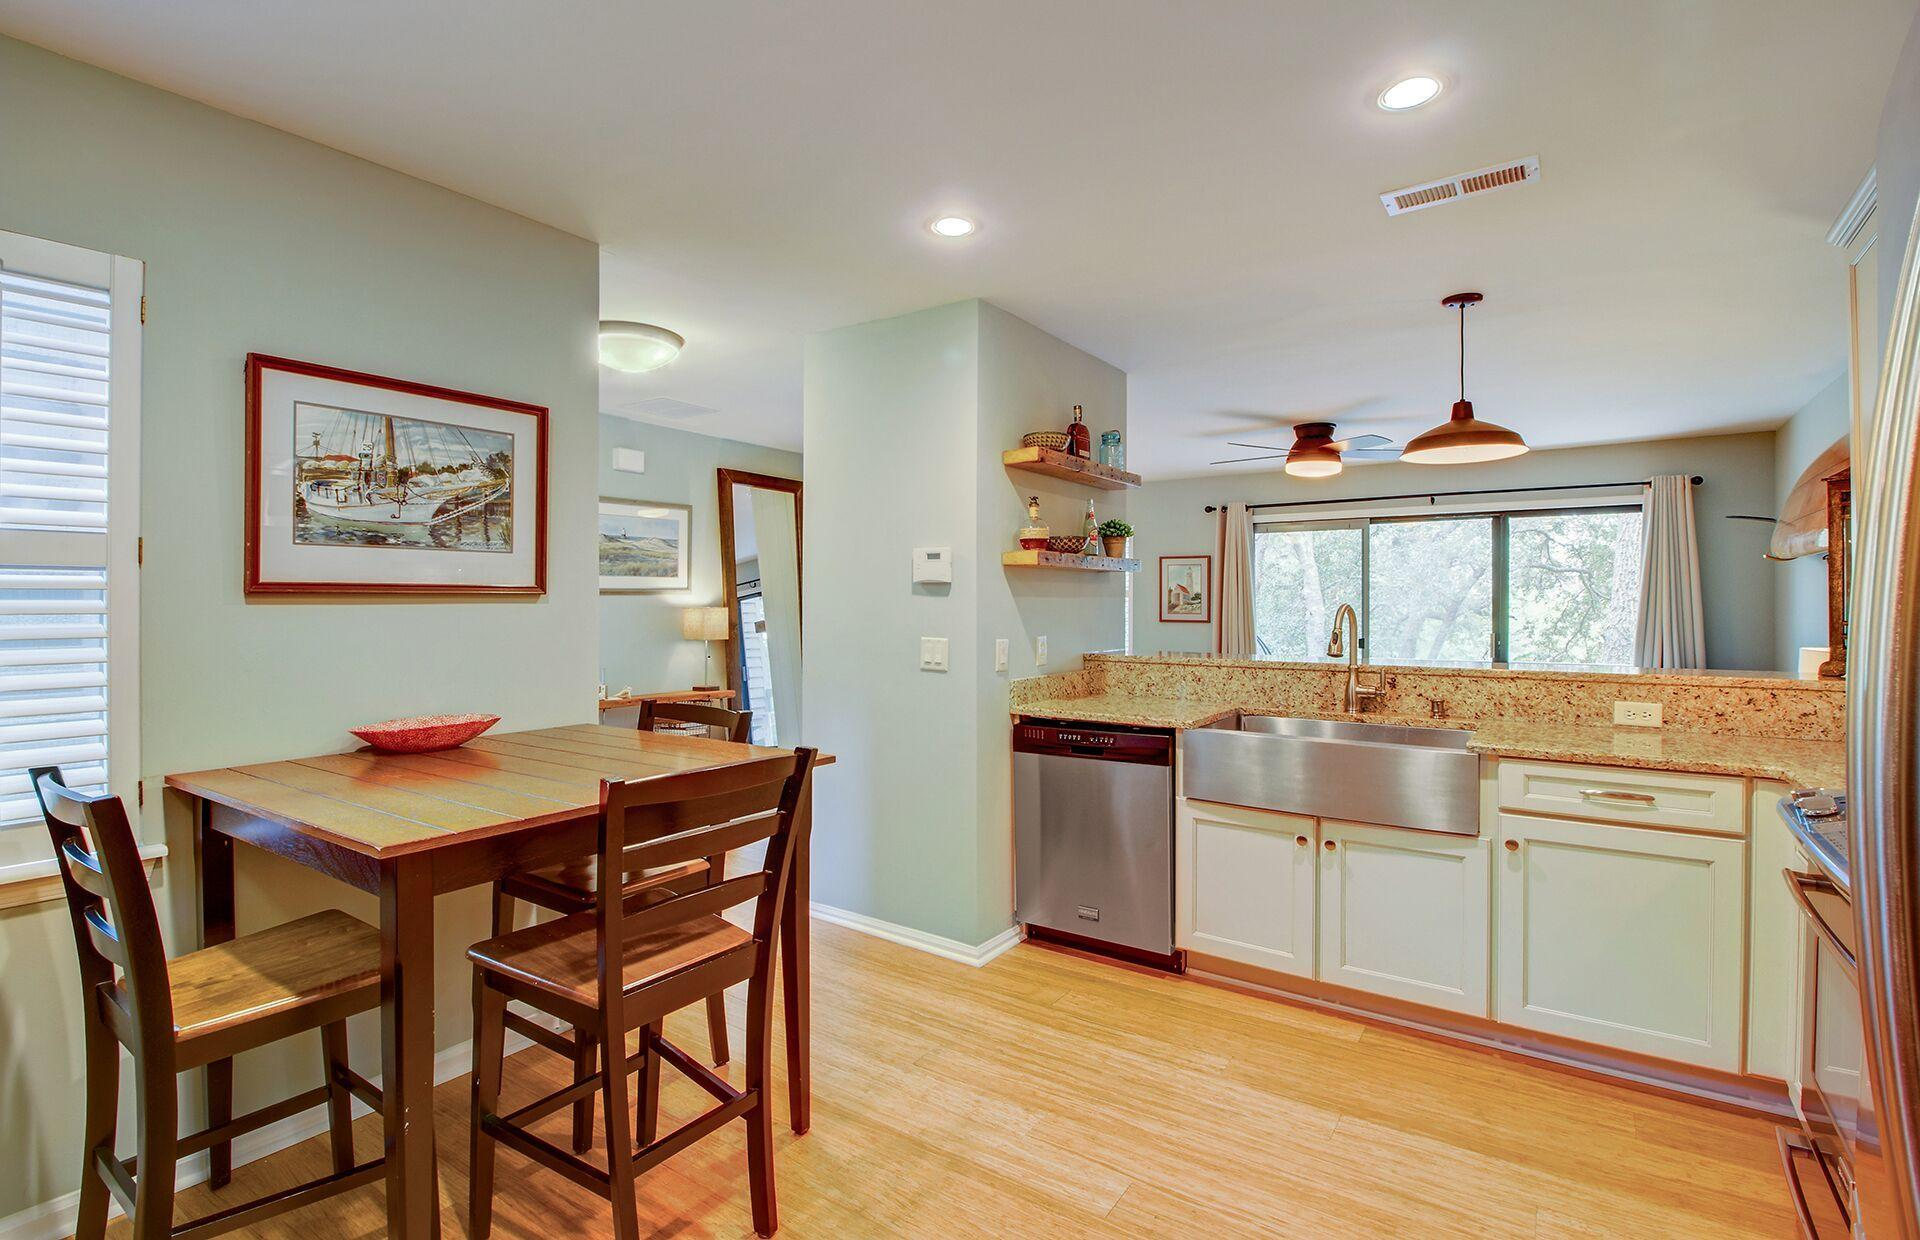 Marsh Point Homes For Sale - 1043 Marsh Court, Mount Pleasant, SC - 13